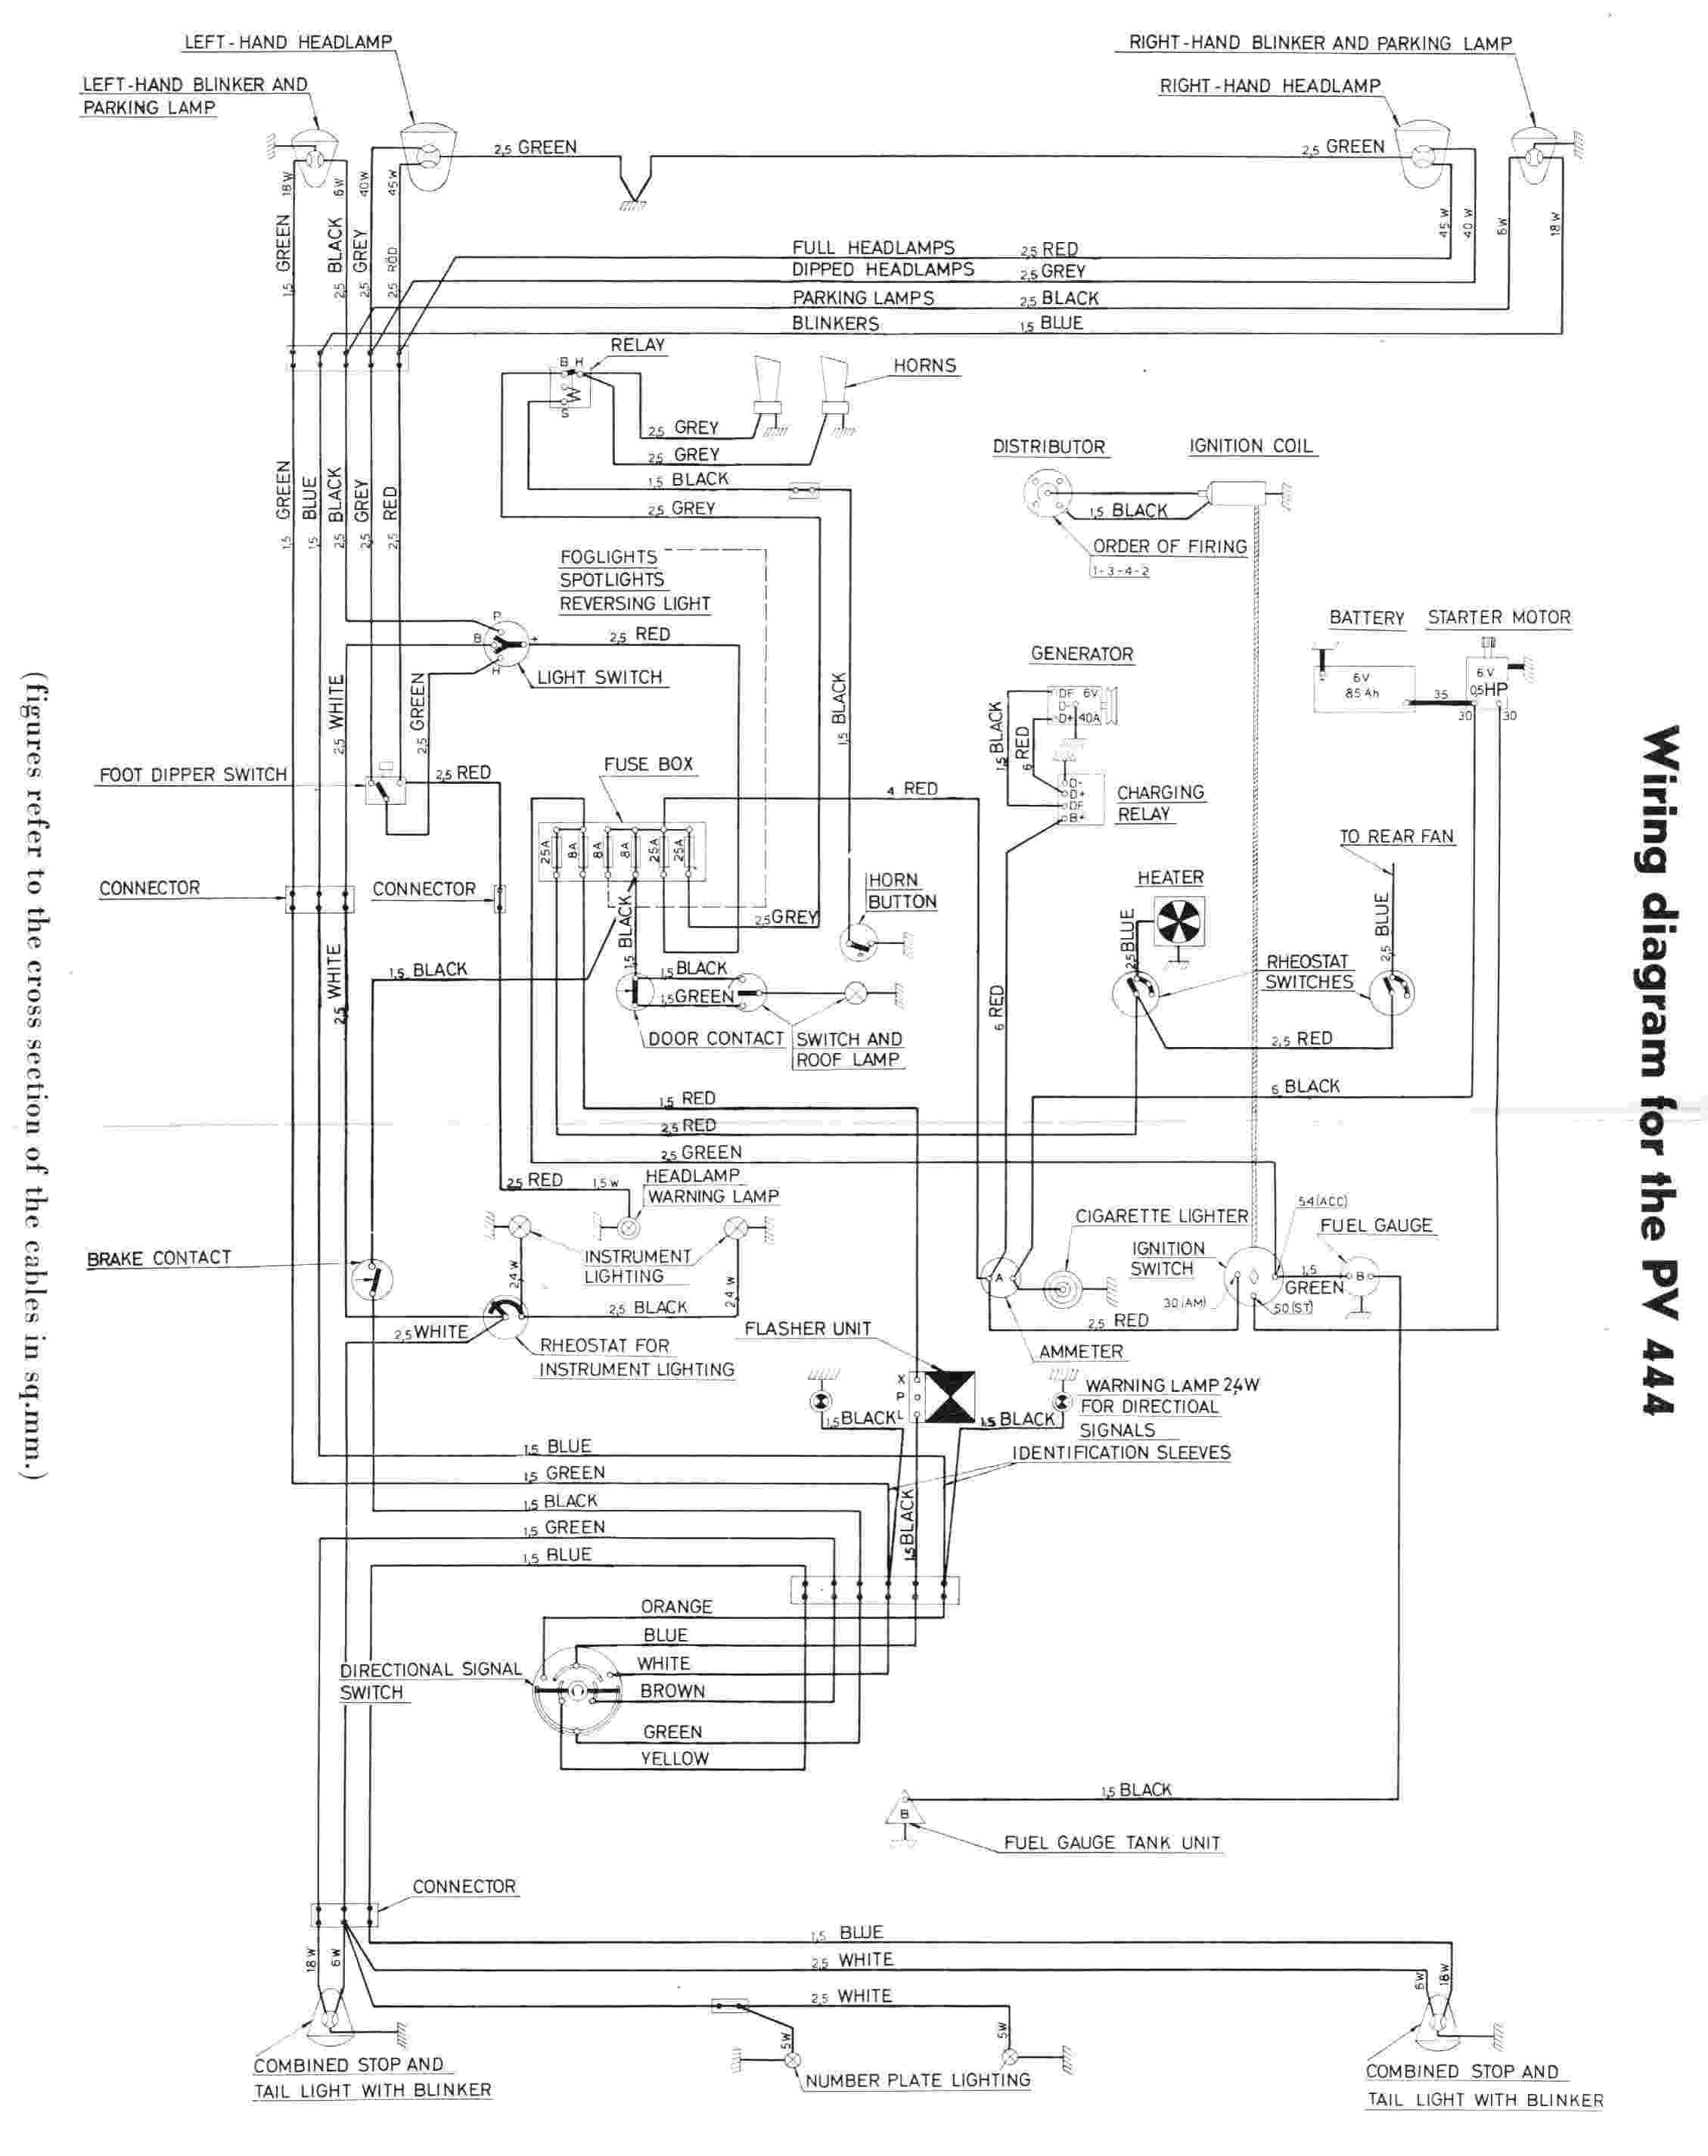 medium resolution of juki ac wiring 240 10 11 manualuniverse co u2022240 ac wiring schematic diagram rh 10